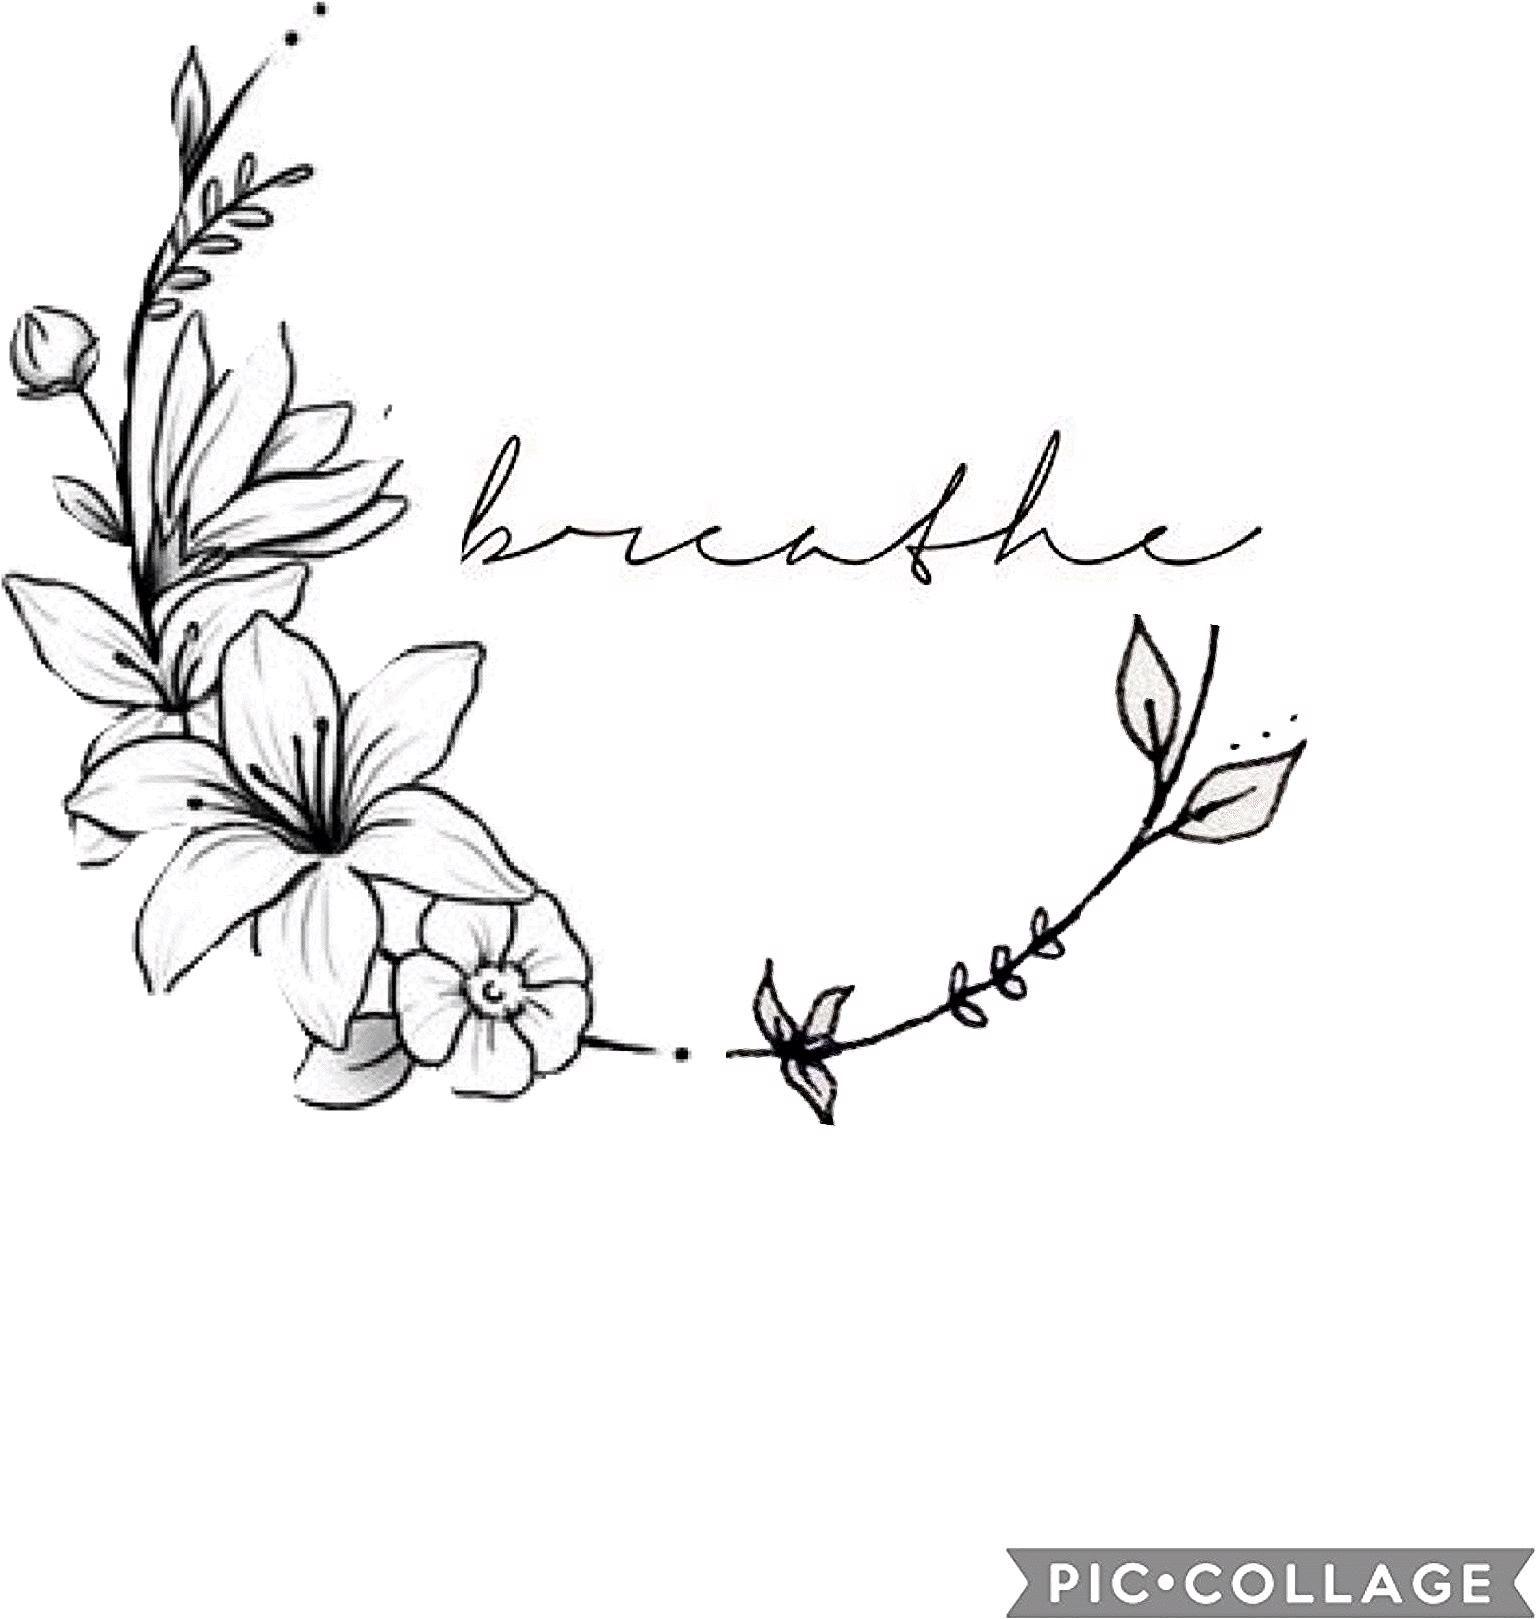 Pin By Gabriela Hurtado Martinez On Orchidee In 2020 Henna Body Art Body Art Tattoos Watercolor Flowers Paintings